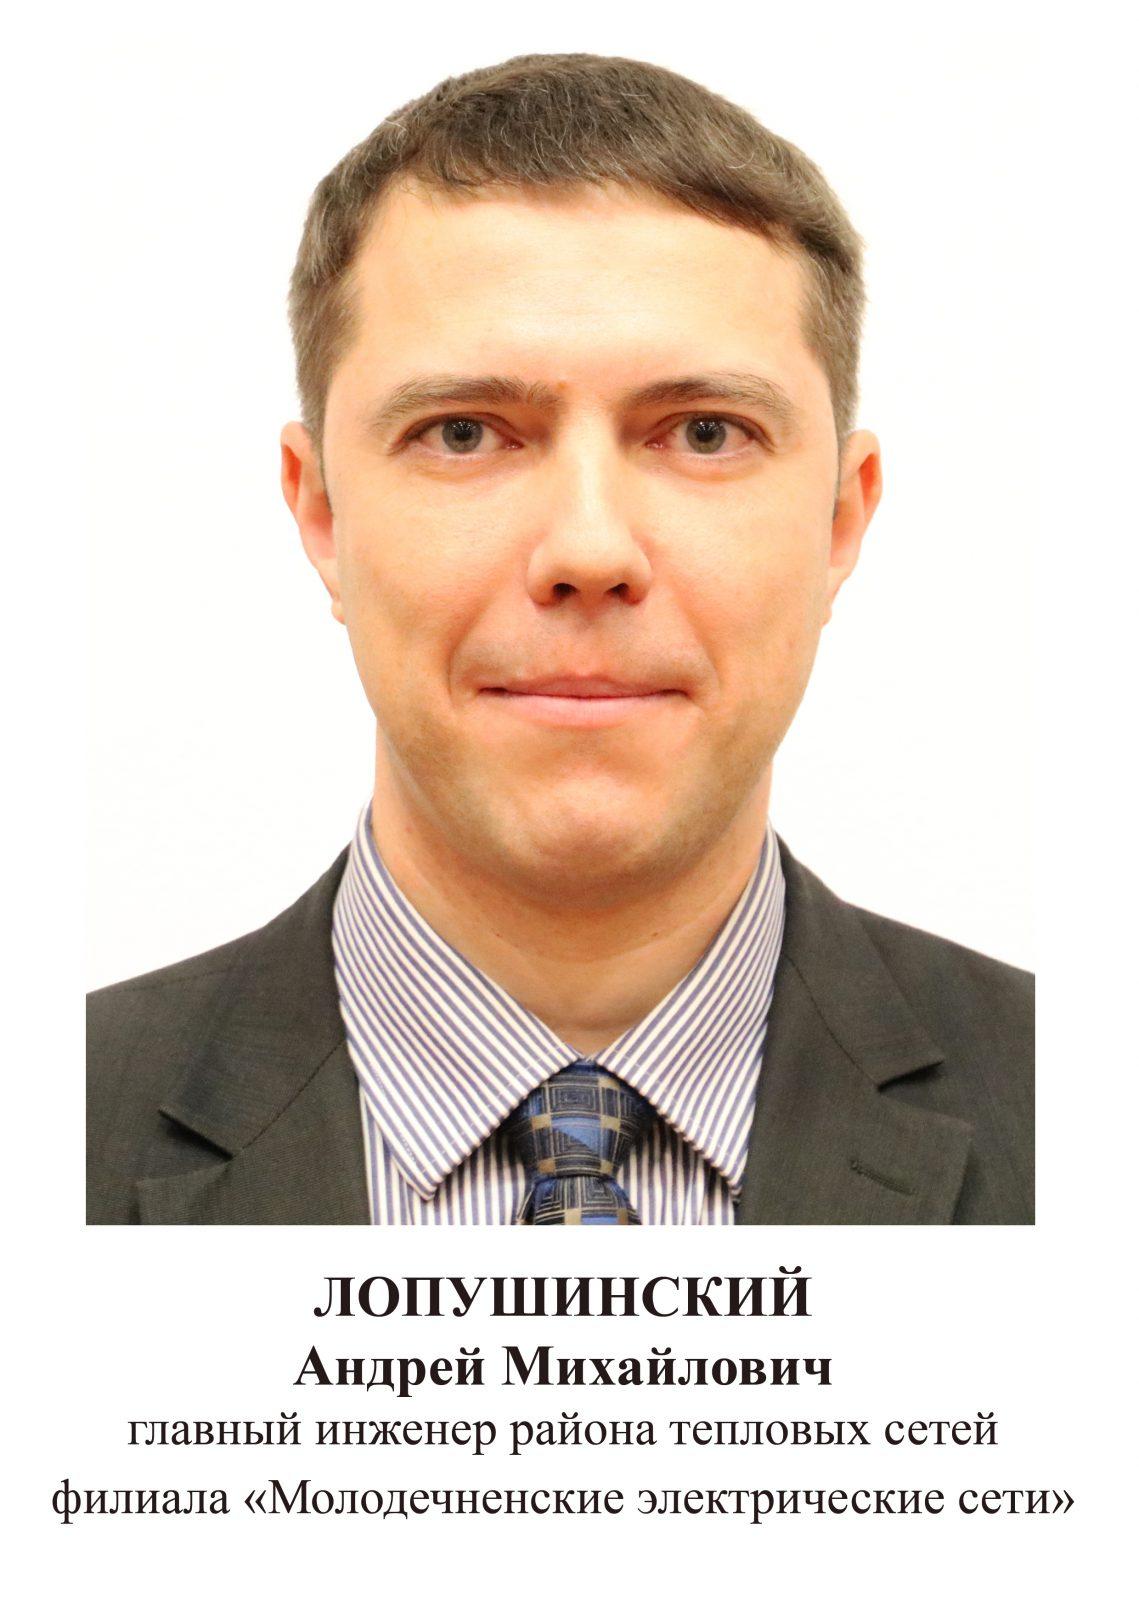 Лопушинский Андрей Михайлович